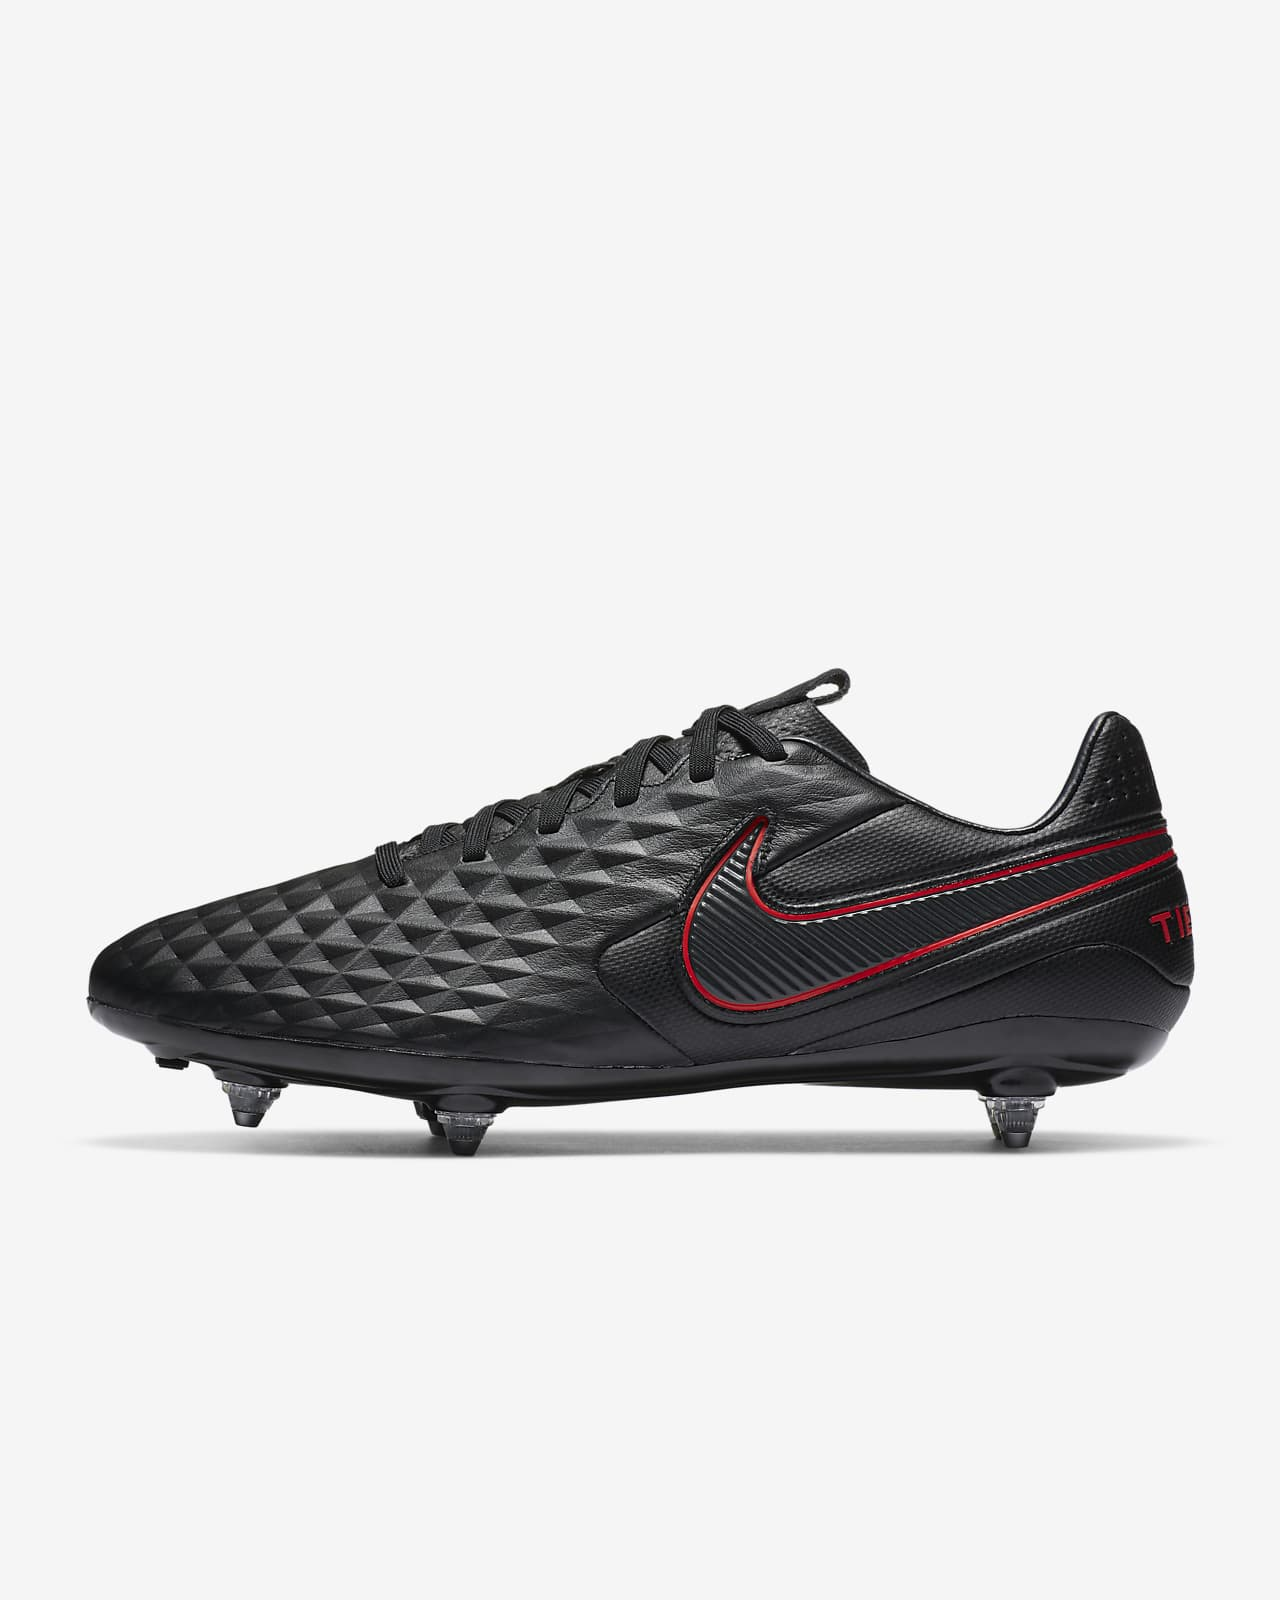 Nike Tiempo Legend 8 Pro SG Soft-Ground Football Boot